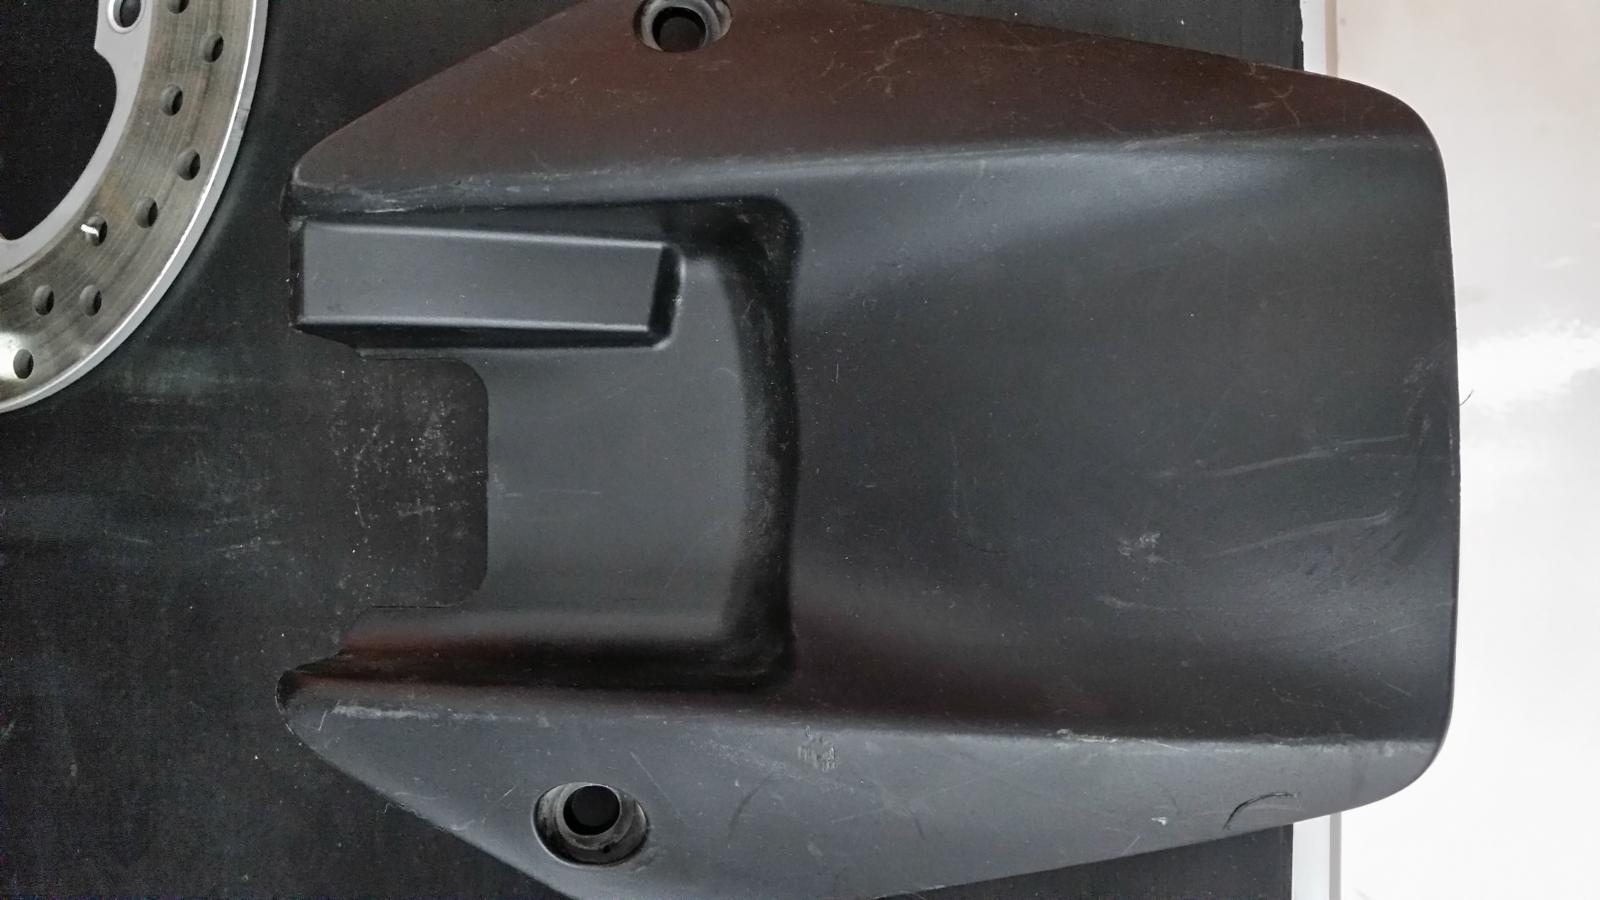 Aleta pase rueda inferior Honda cbr 1000 rr 2008 - 2012